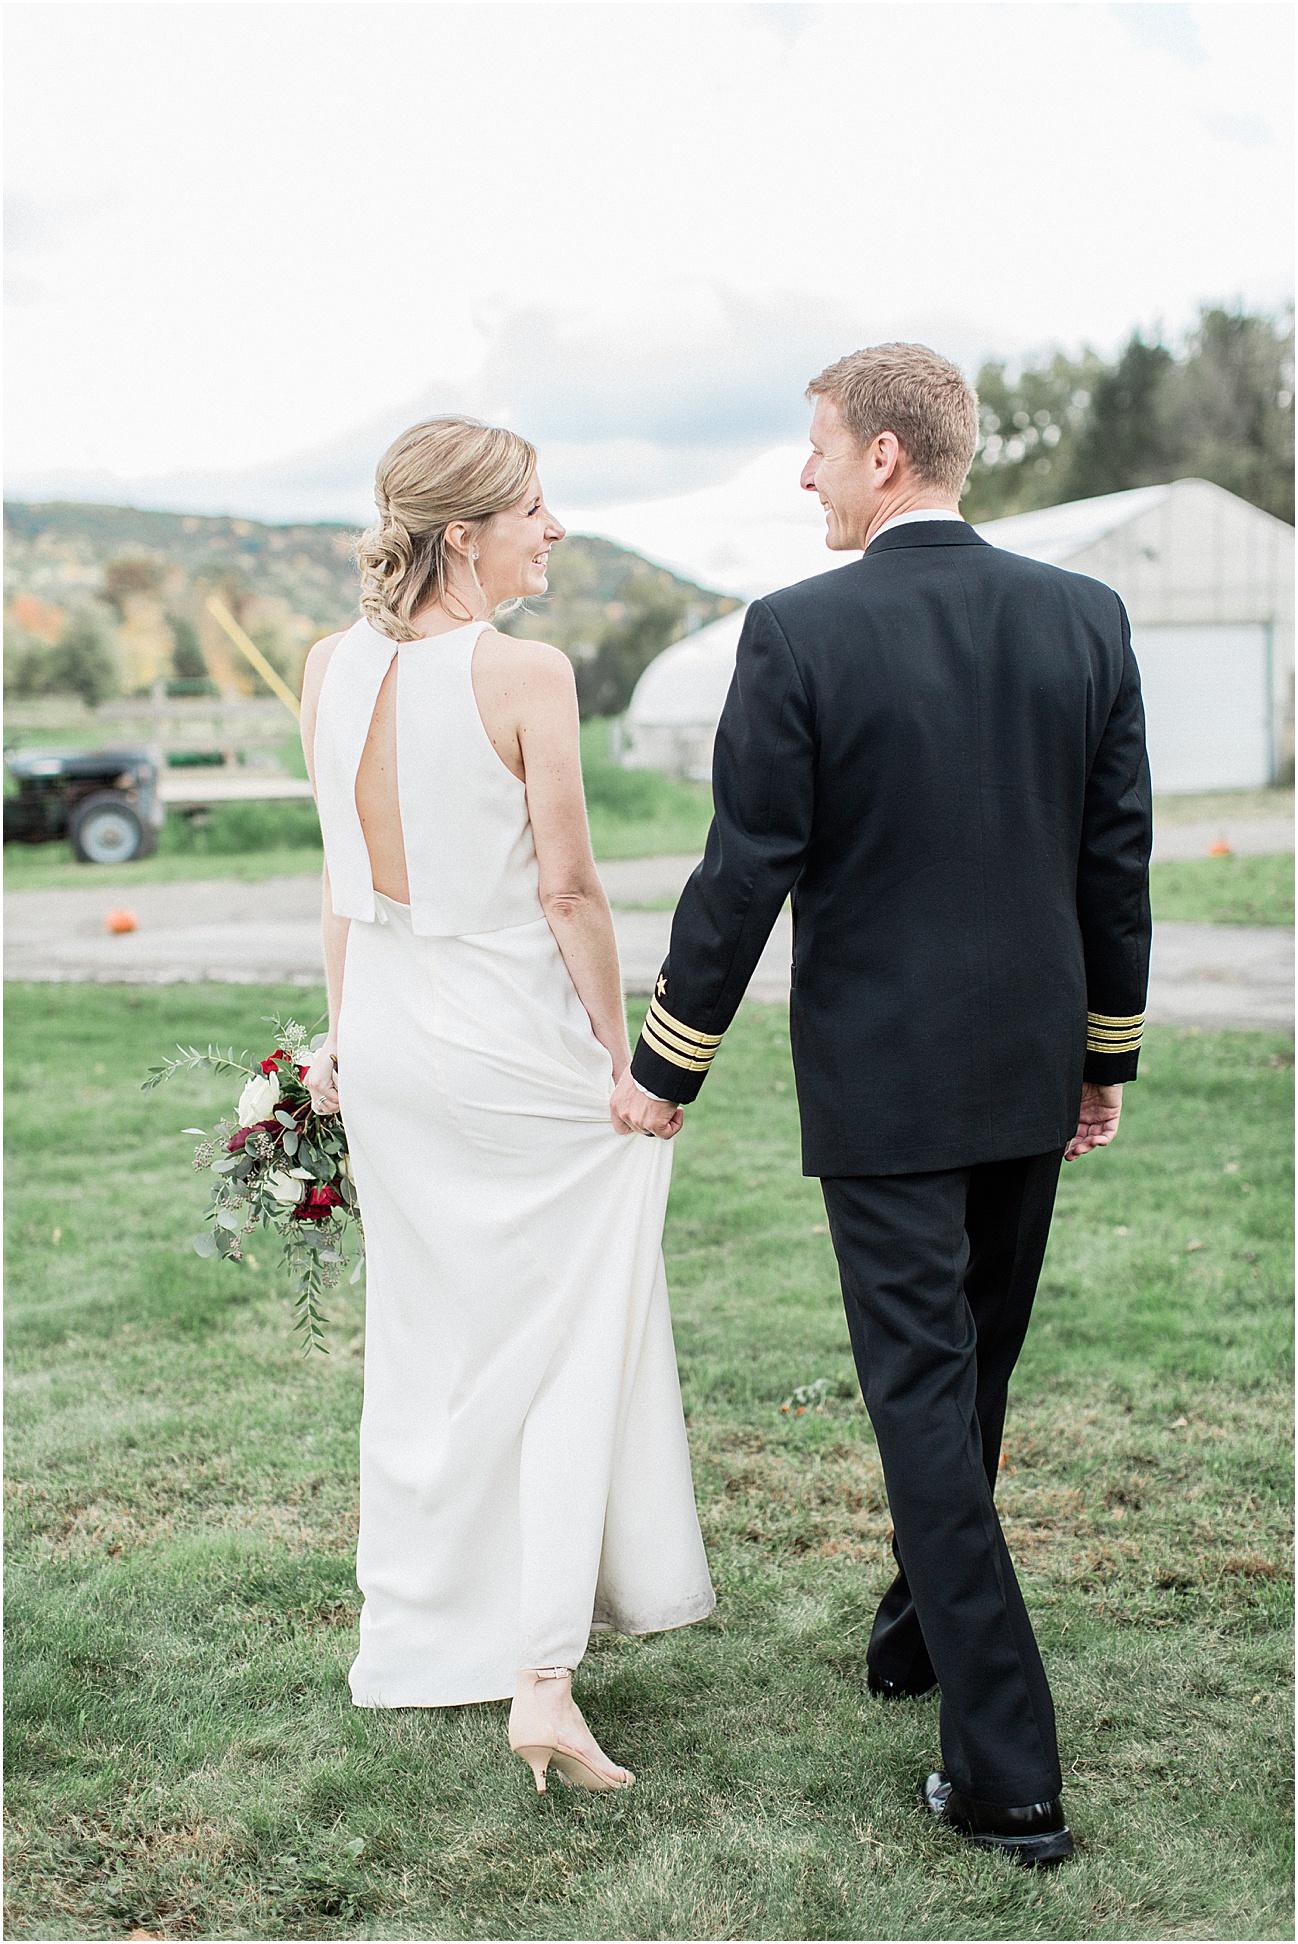 lauren_john_jon_ablany_browns_brewery_moses_farm_fall_cape_cod_boston_wedding_photographer_meredith_jane_photography_photo_1520.jpg